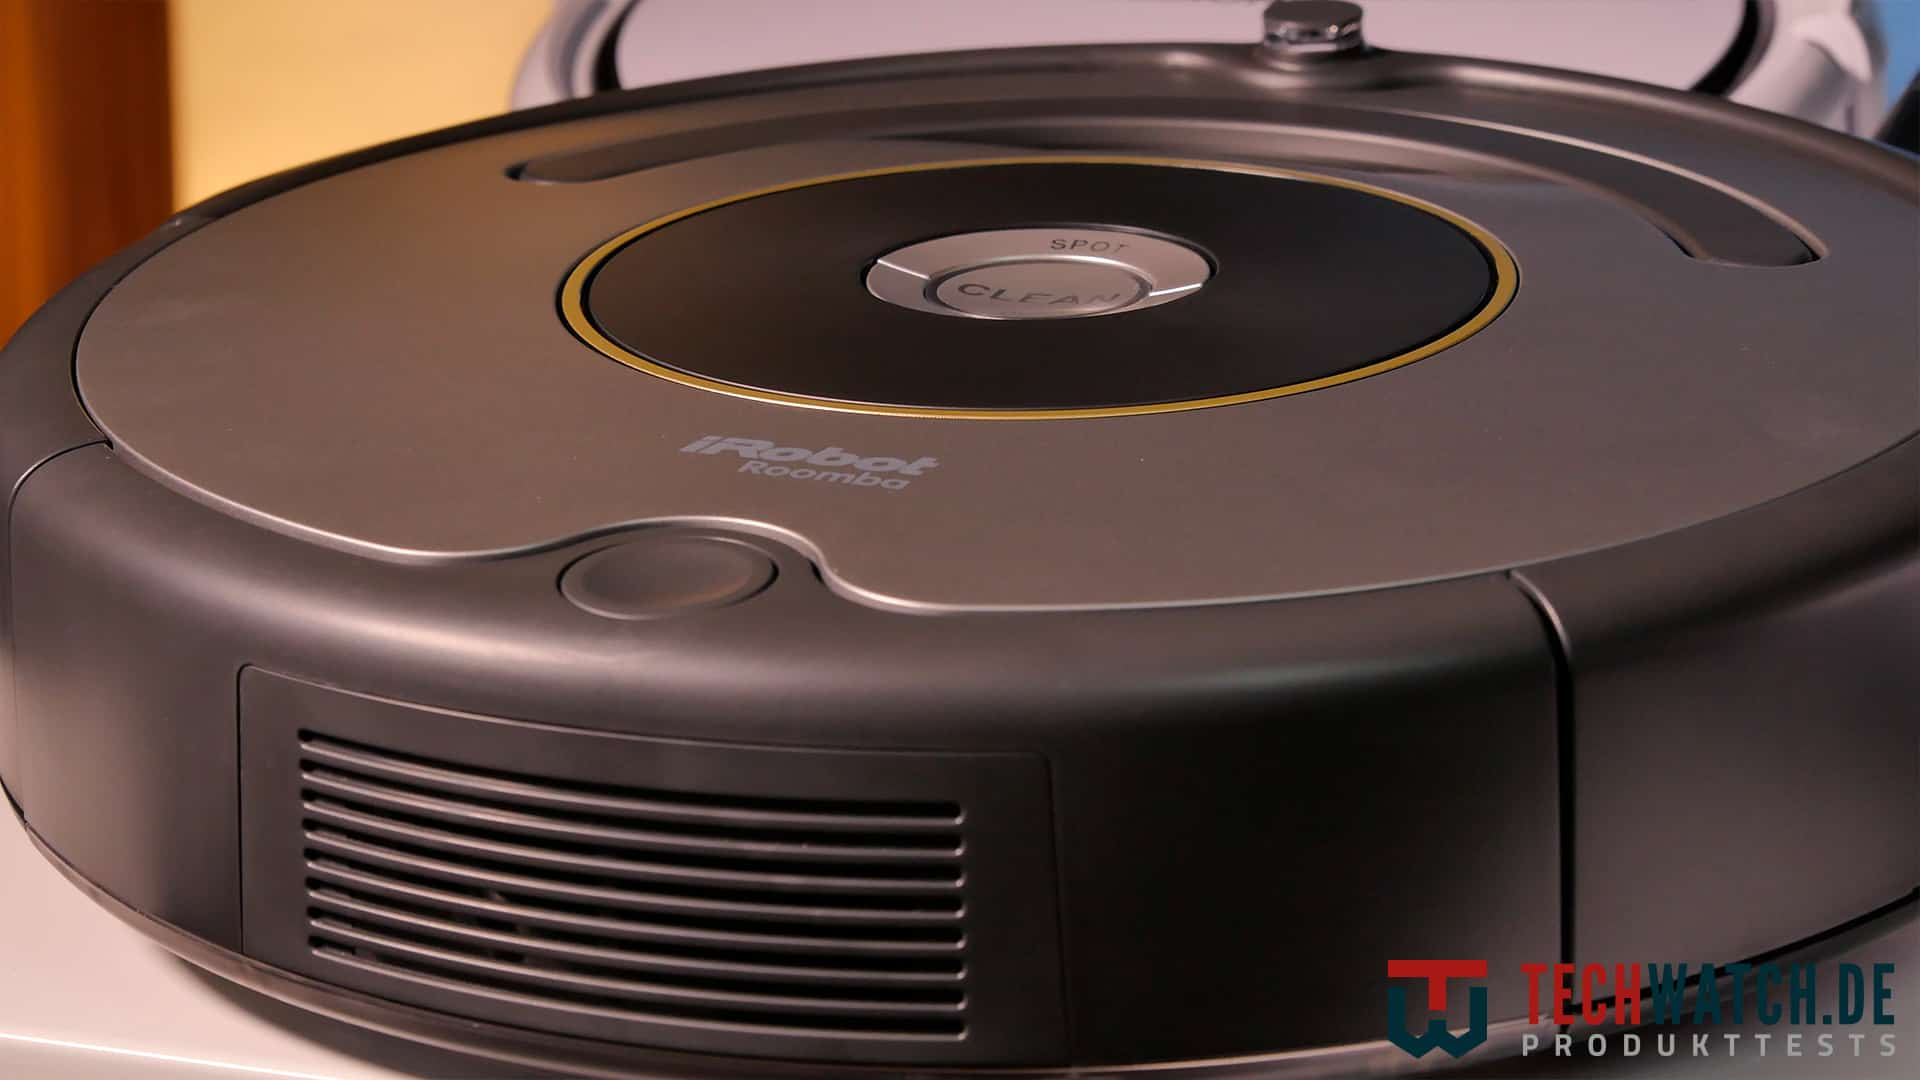 iRobot Roomba 615 Front